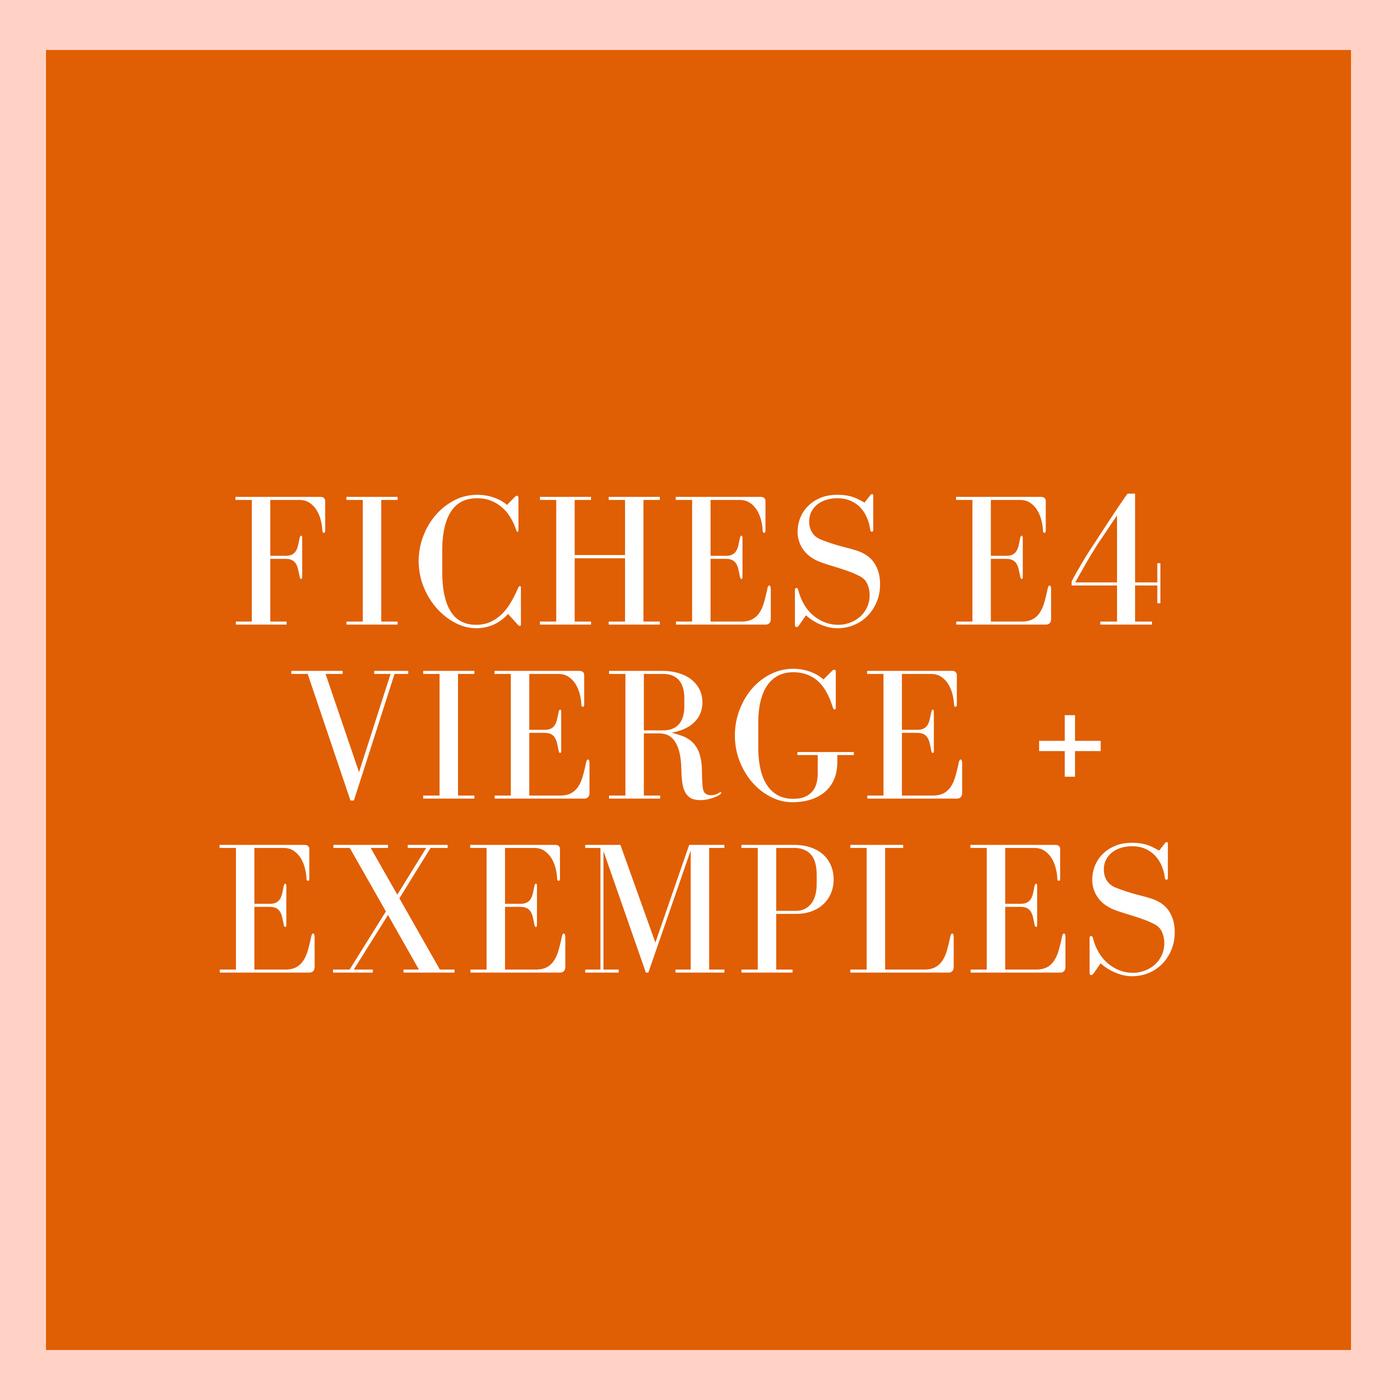 Fiche E4 vierge + exemples